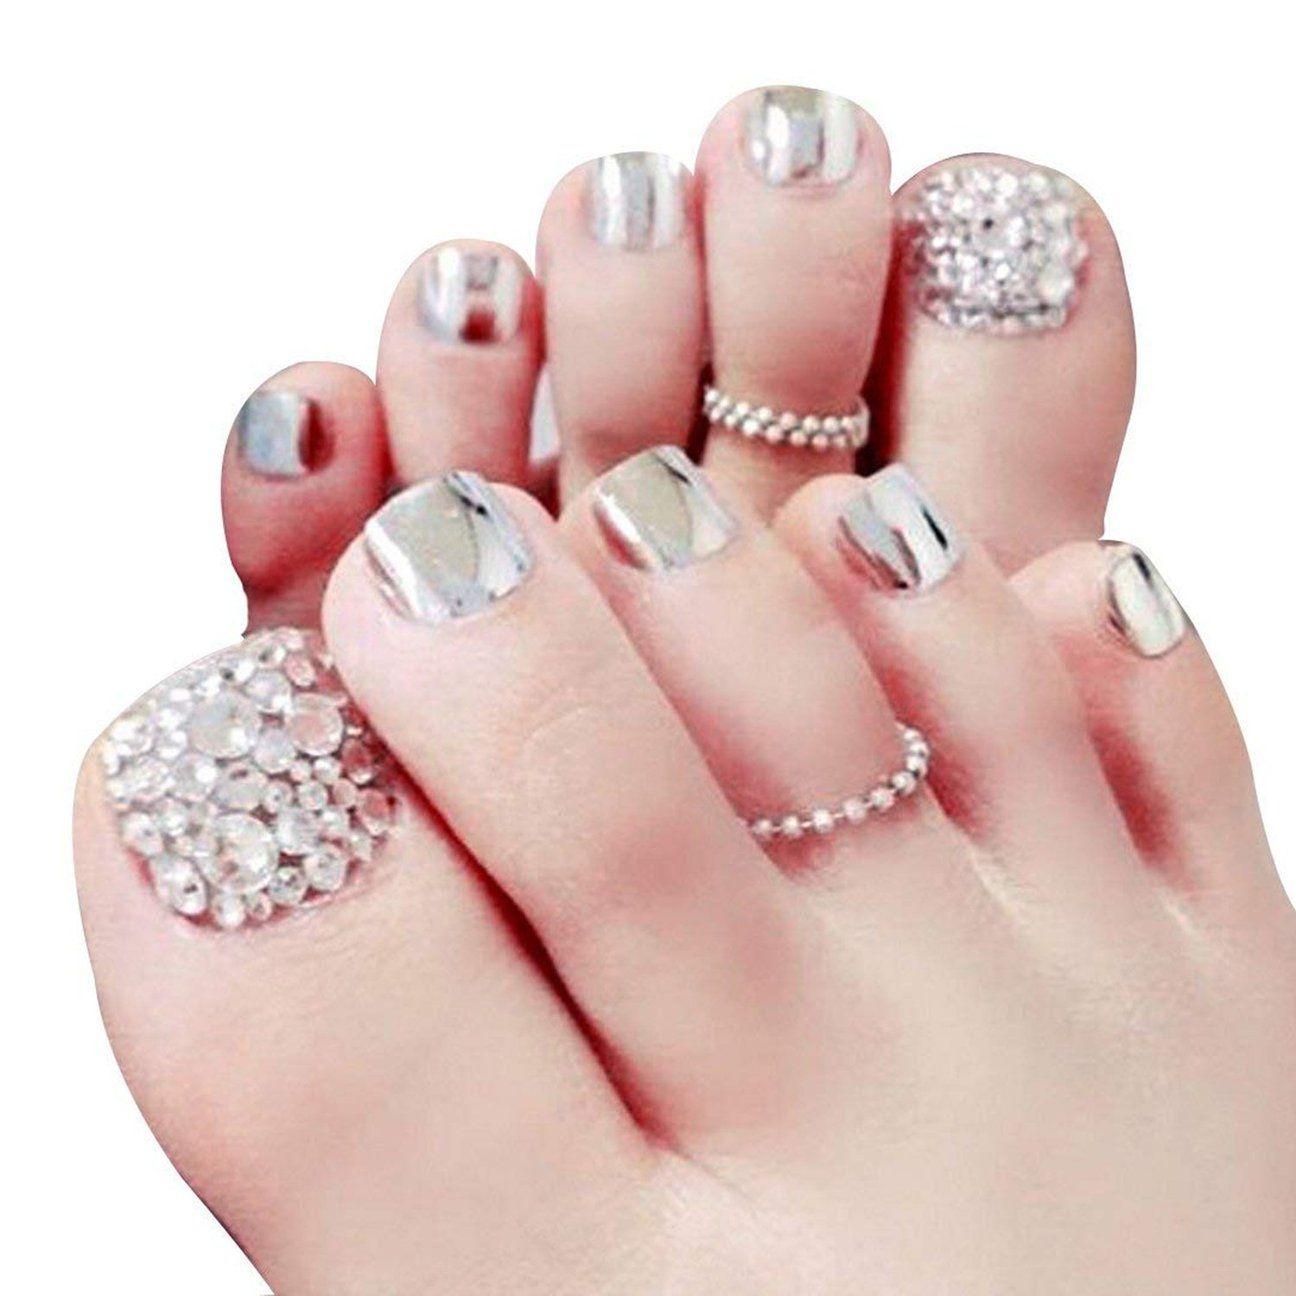 Silver Mirrored Rhinestone Press On Toenails Summer Toe Nails Cute Toe Nails Toe Nail Designs